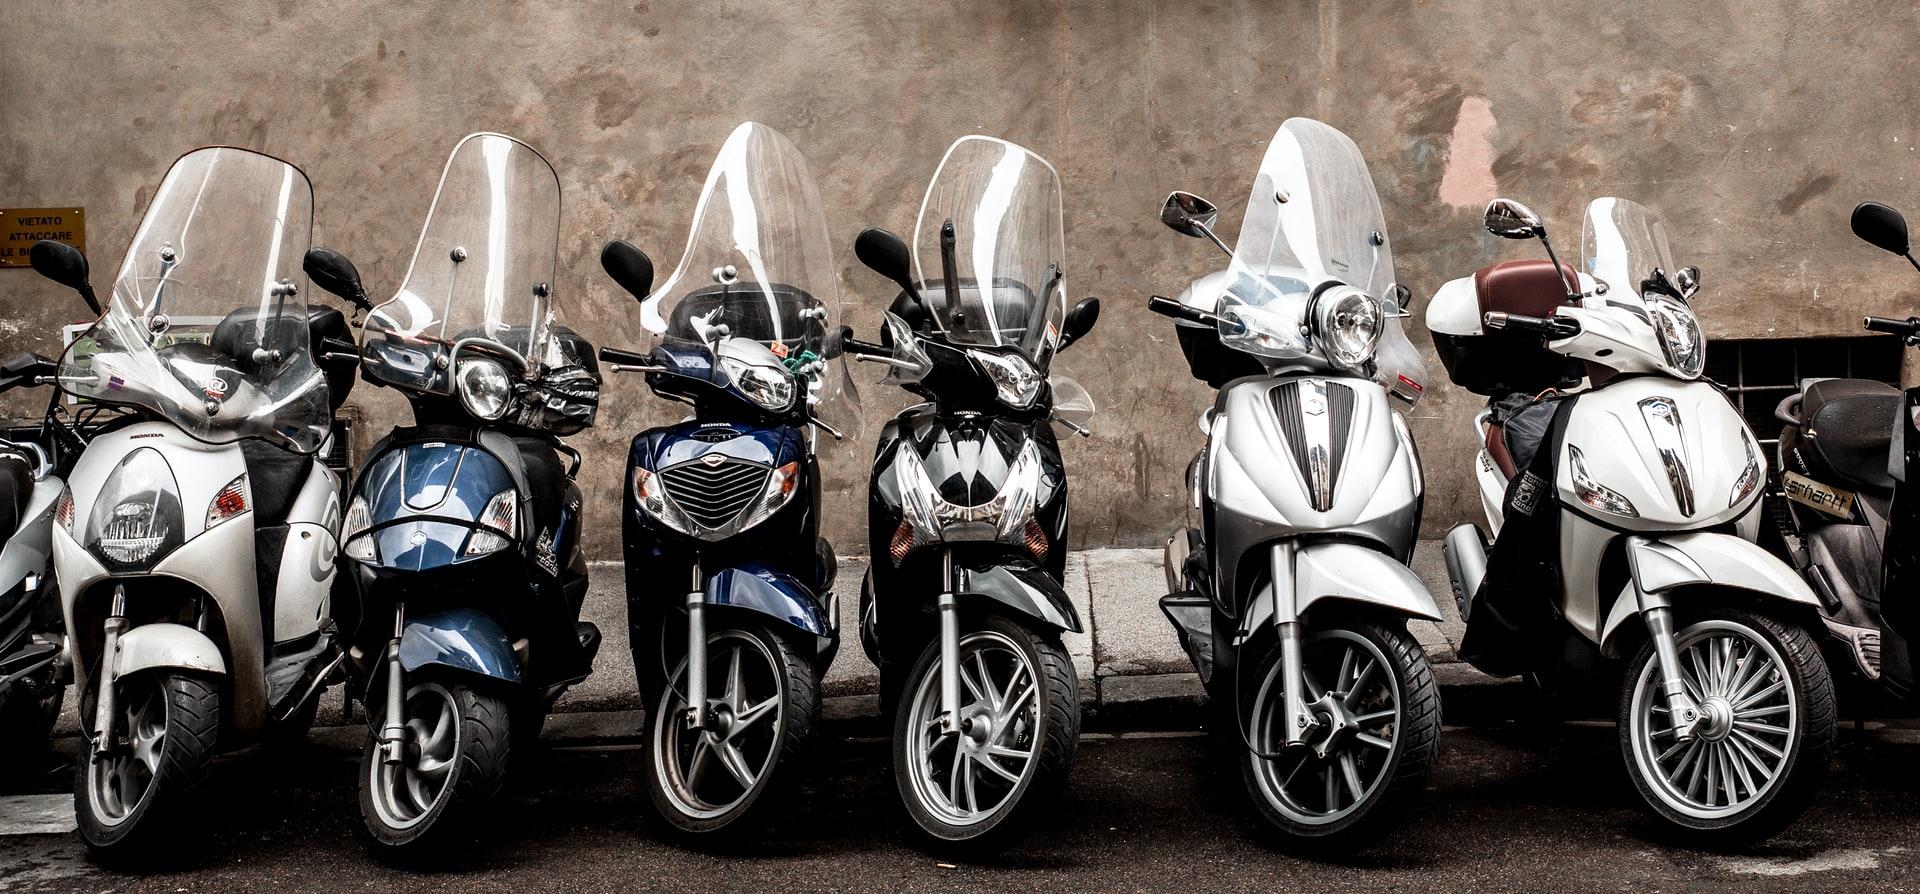 Motorcycle parking Sydney CBD